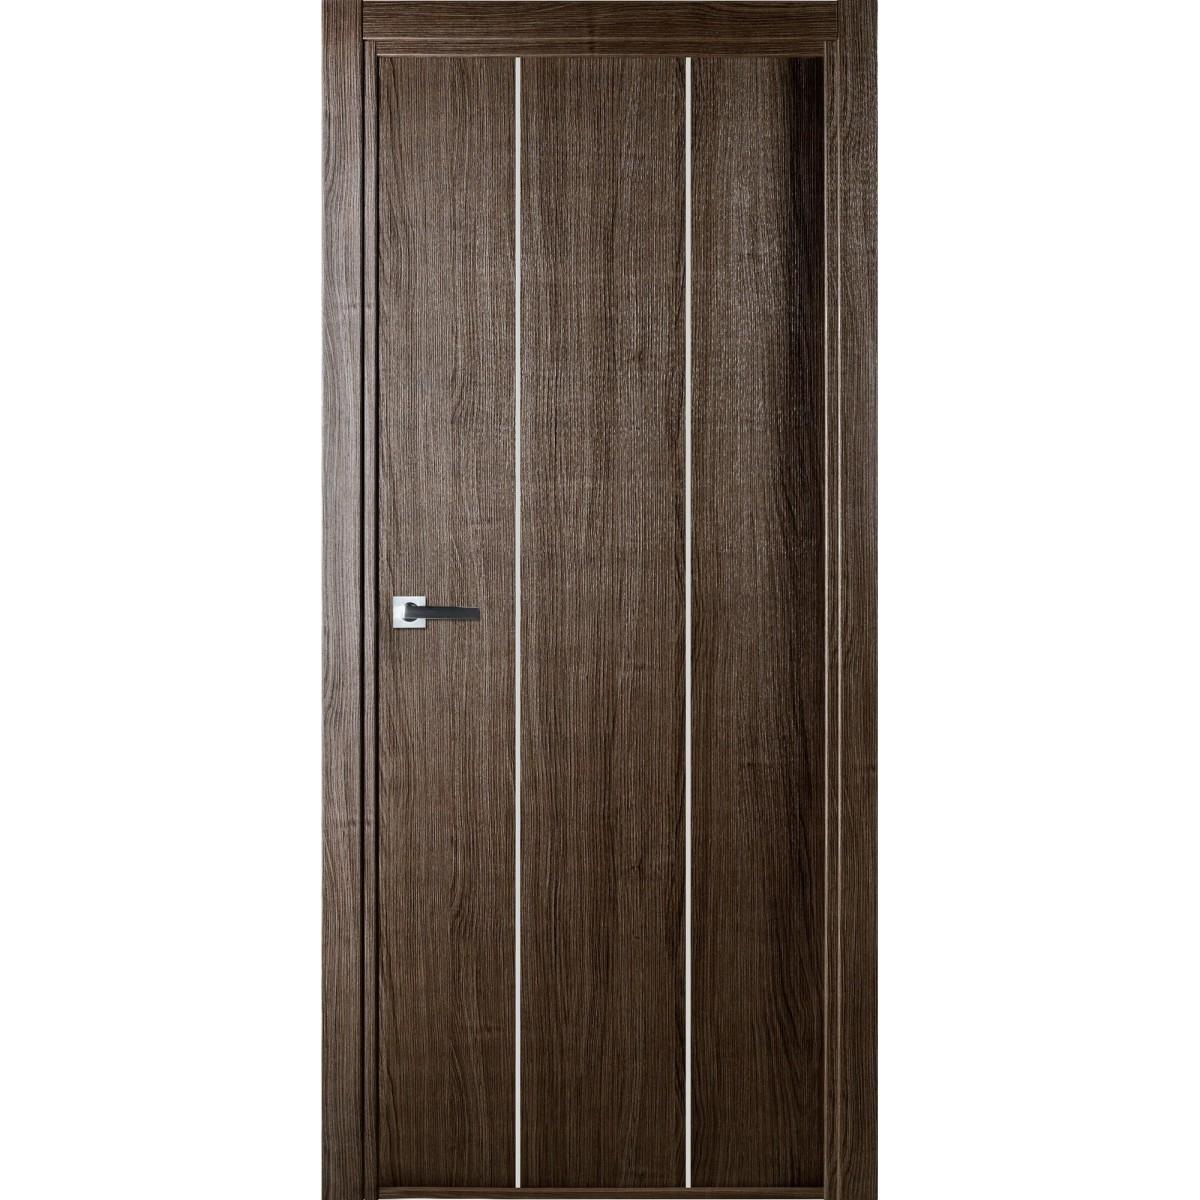 Дверь Межкомнатная Глухая Спэйс 80x200 Ламинация Цвет Серый Дуб С Фурнитурой